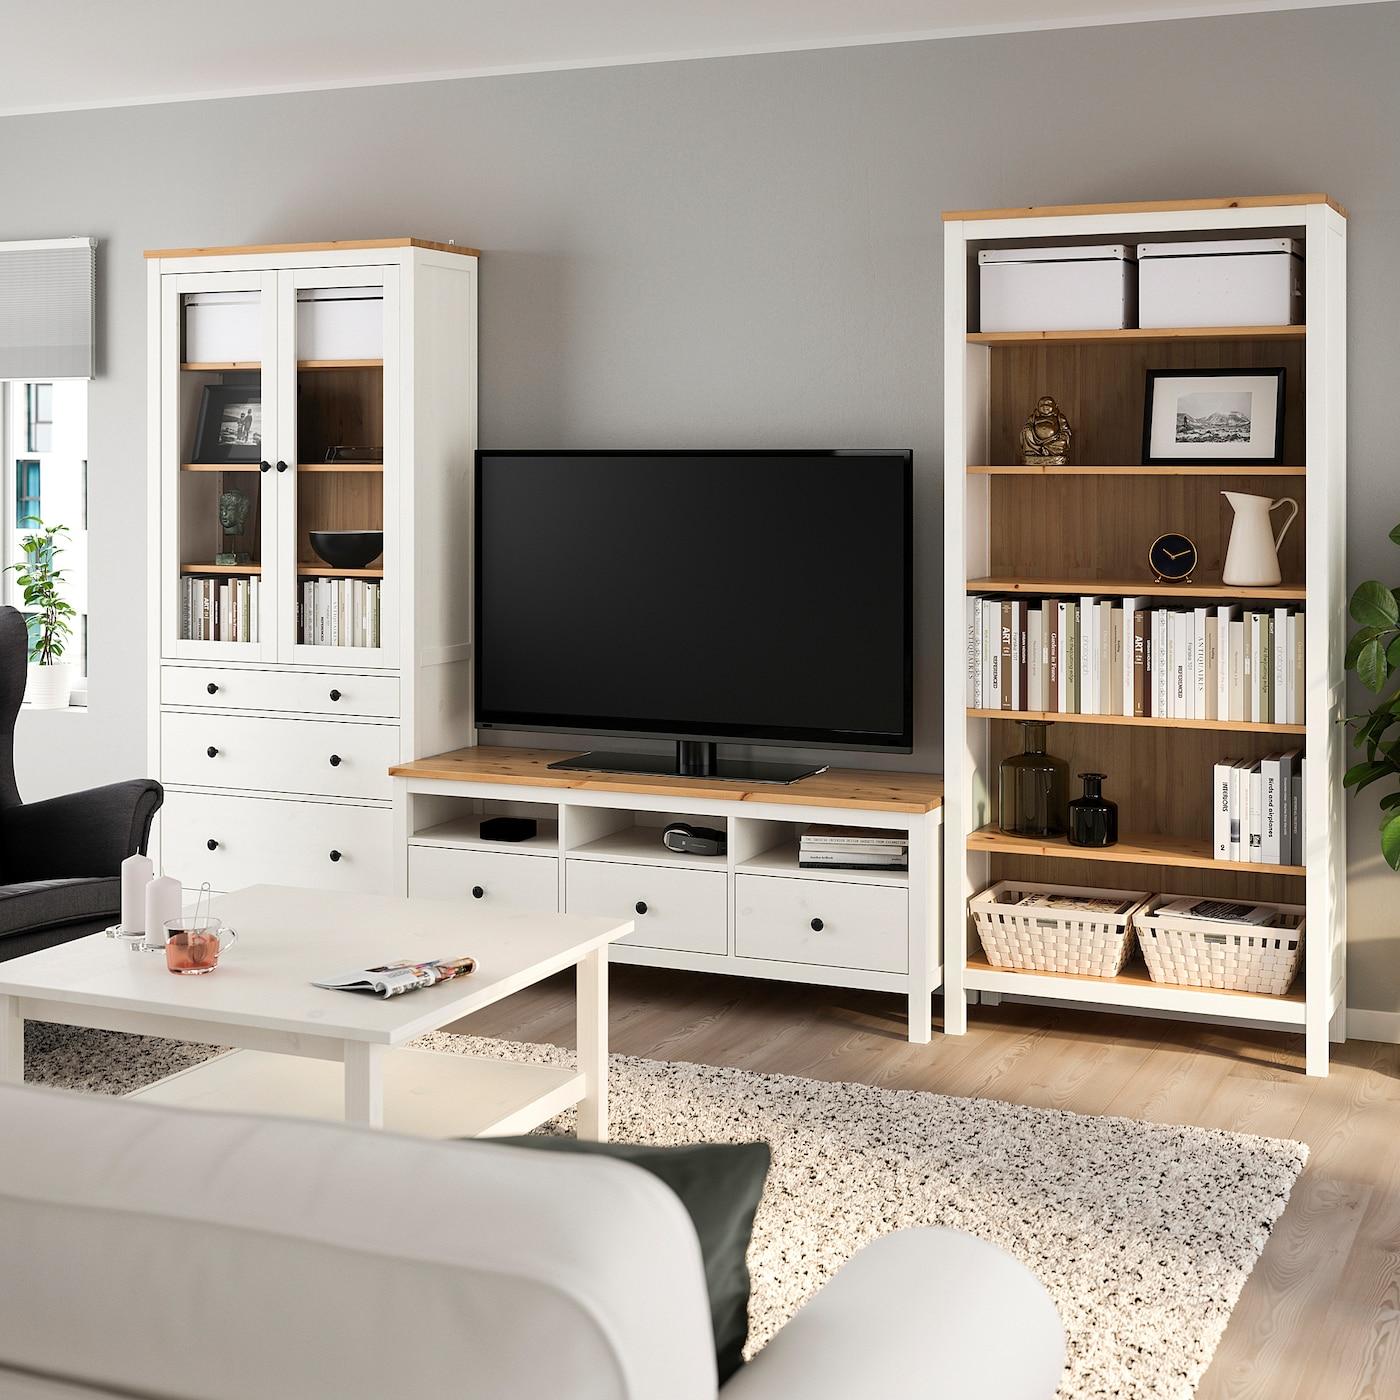 HEMNES مجموعة تخزين تليفزيون - صباغ أبيض/بني فاتح زجاج شفاف 9x9 سم